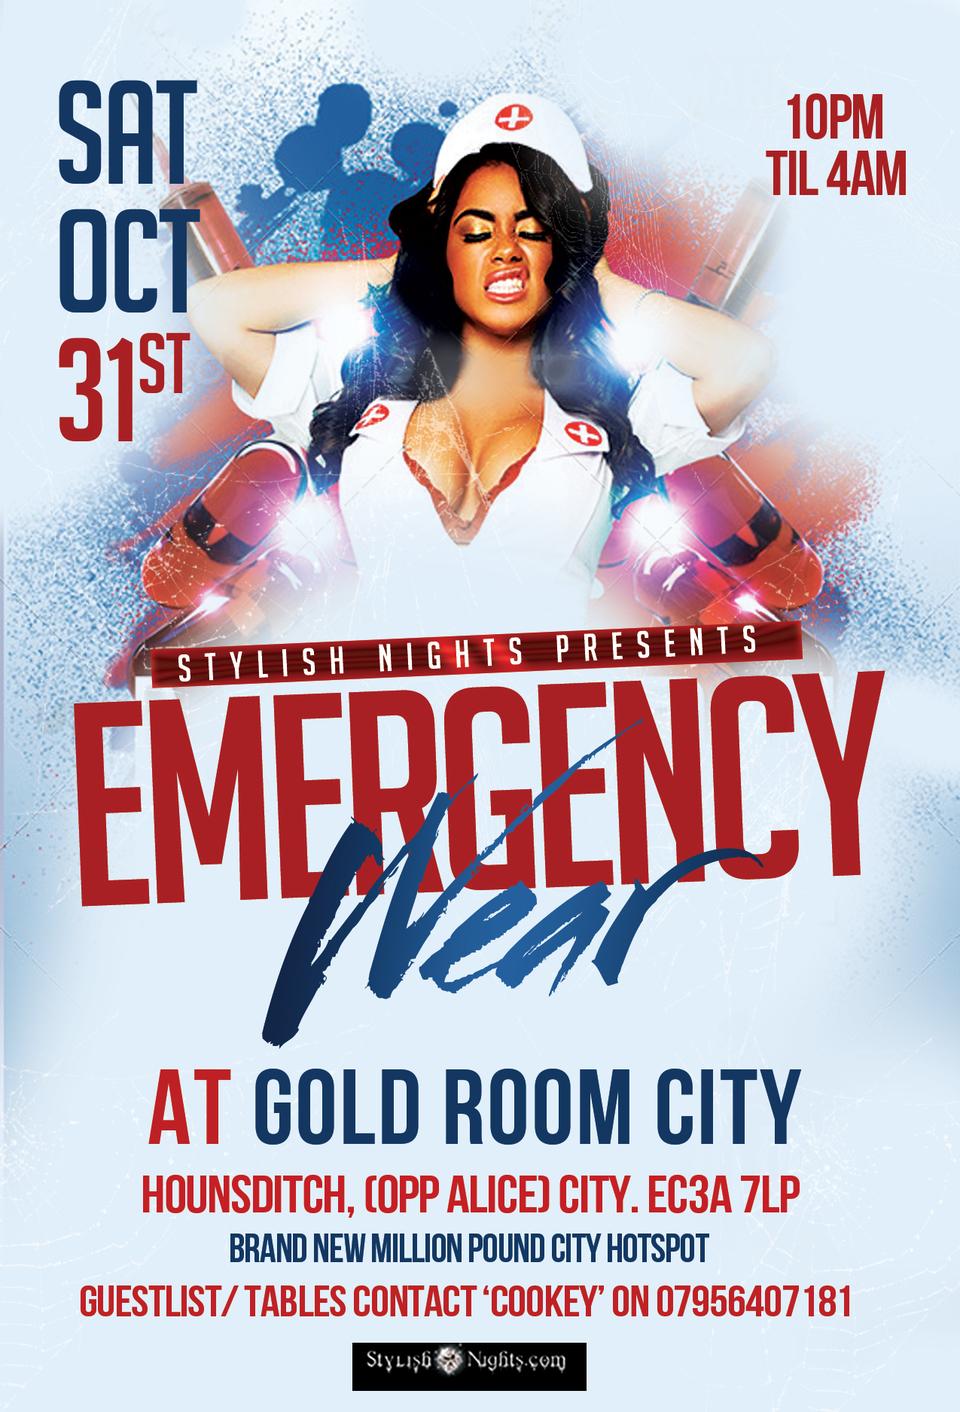 Emergency Wear Party tickets Gold Room City @ Zebrano  Shoobs.com